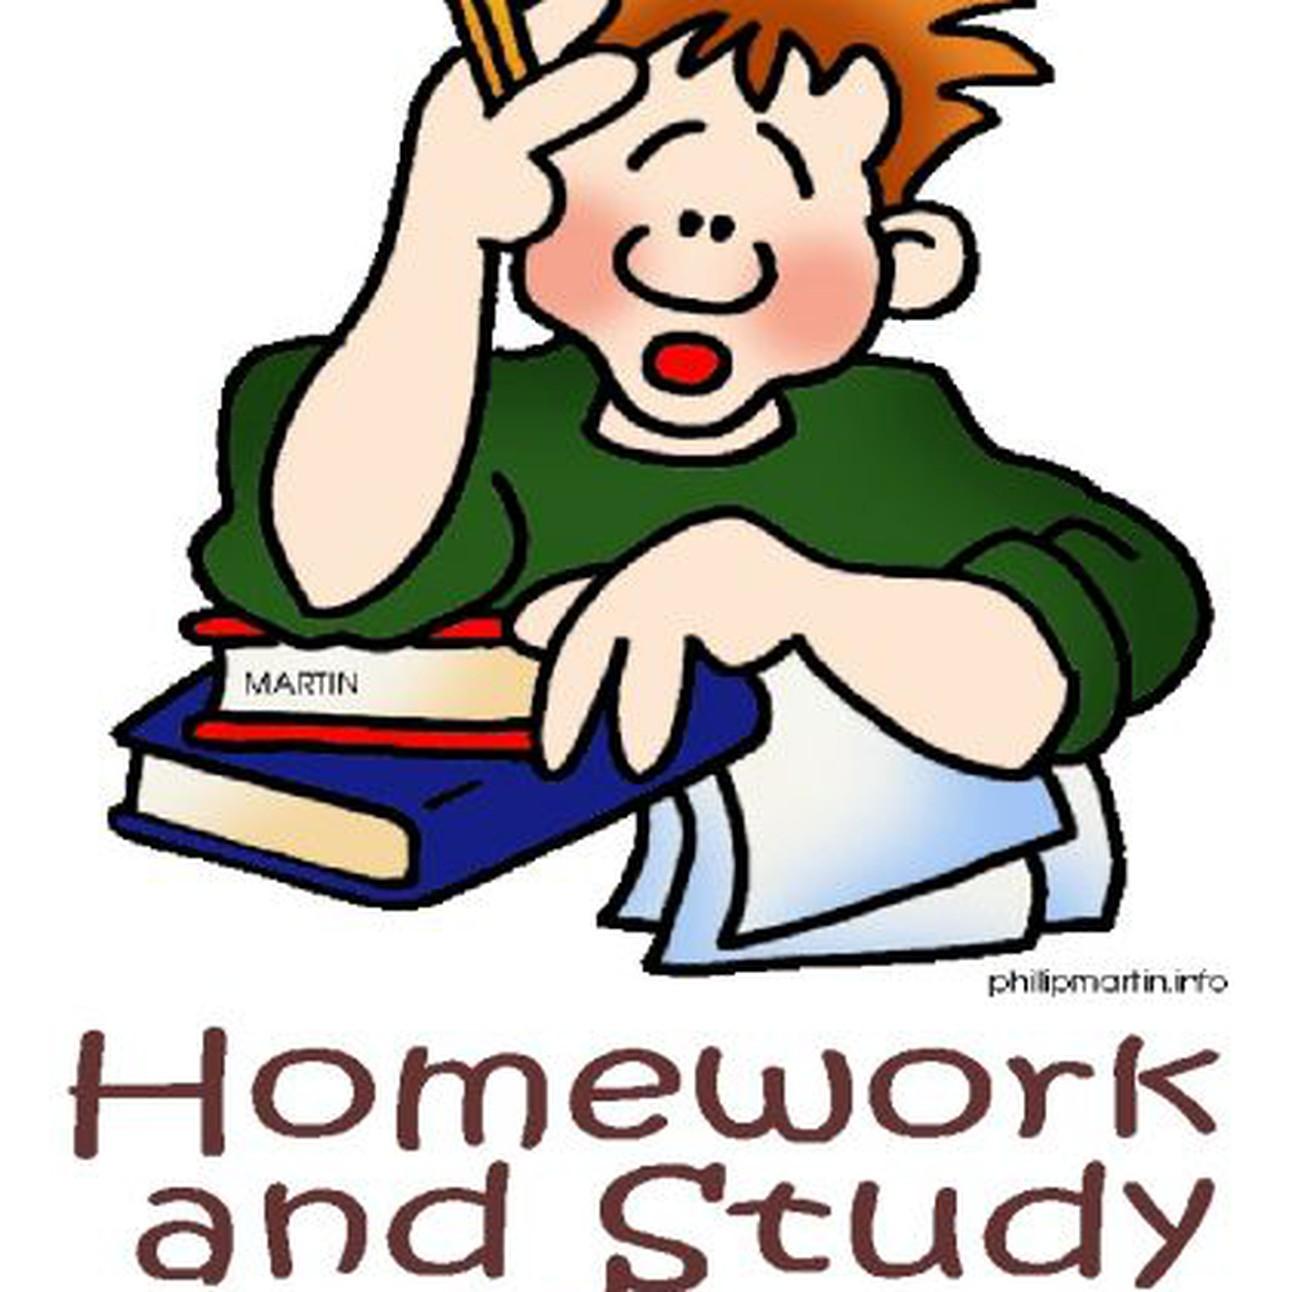 Clipart homework english homework. Online help